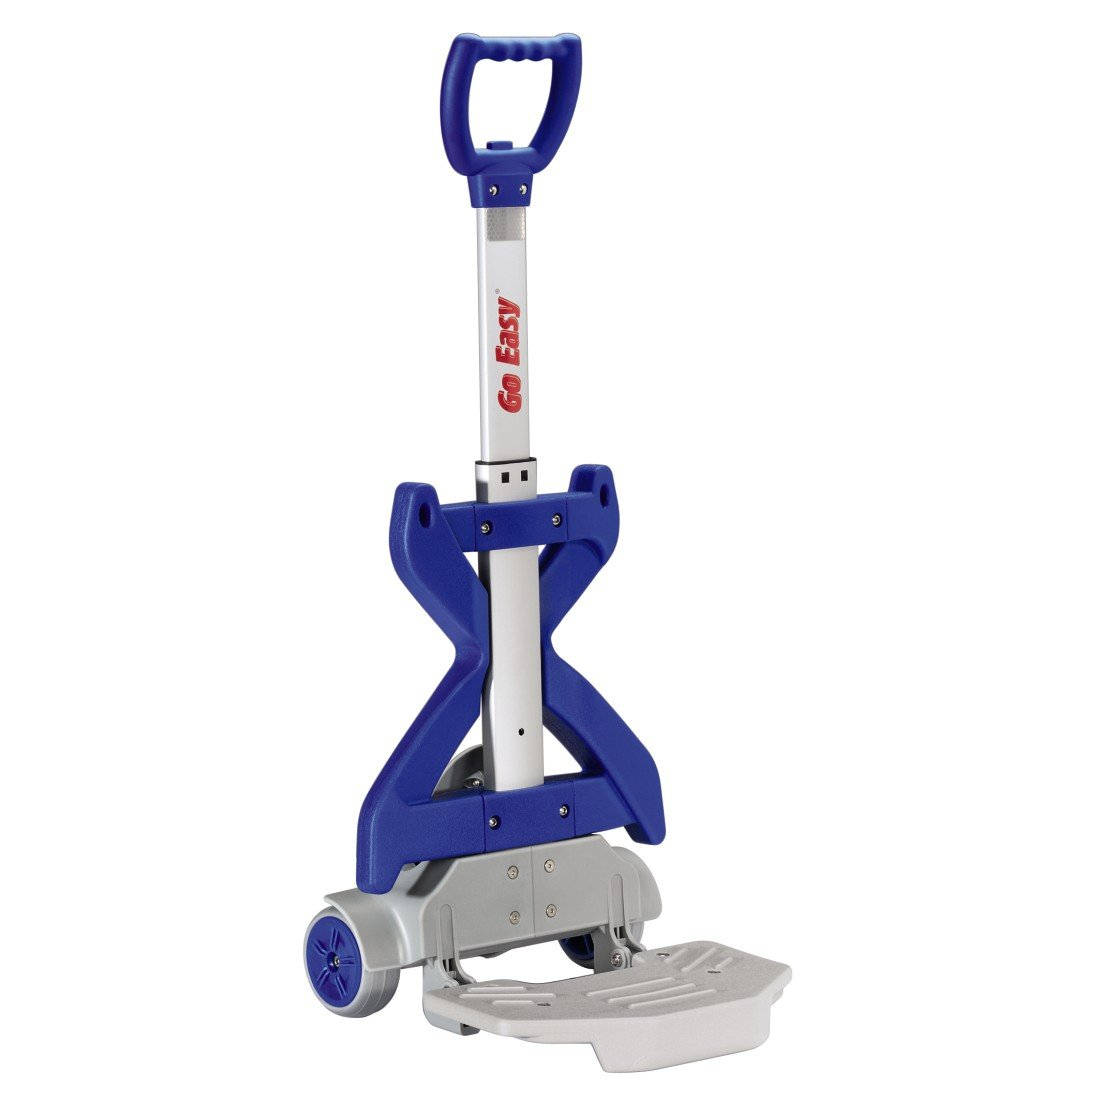 Go Easy Schulranzen Trolley ONE, 59x30x15cm, höhenverstellbar, blau (1 Stück) höhenverstellbar blau (1 Stück) 103174